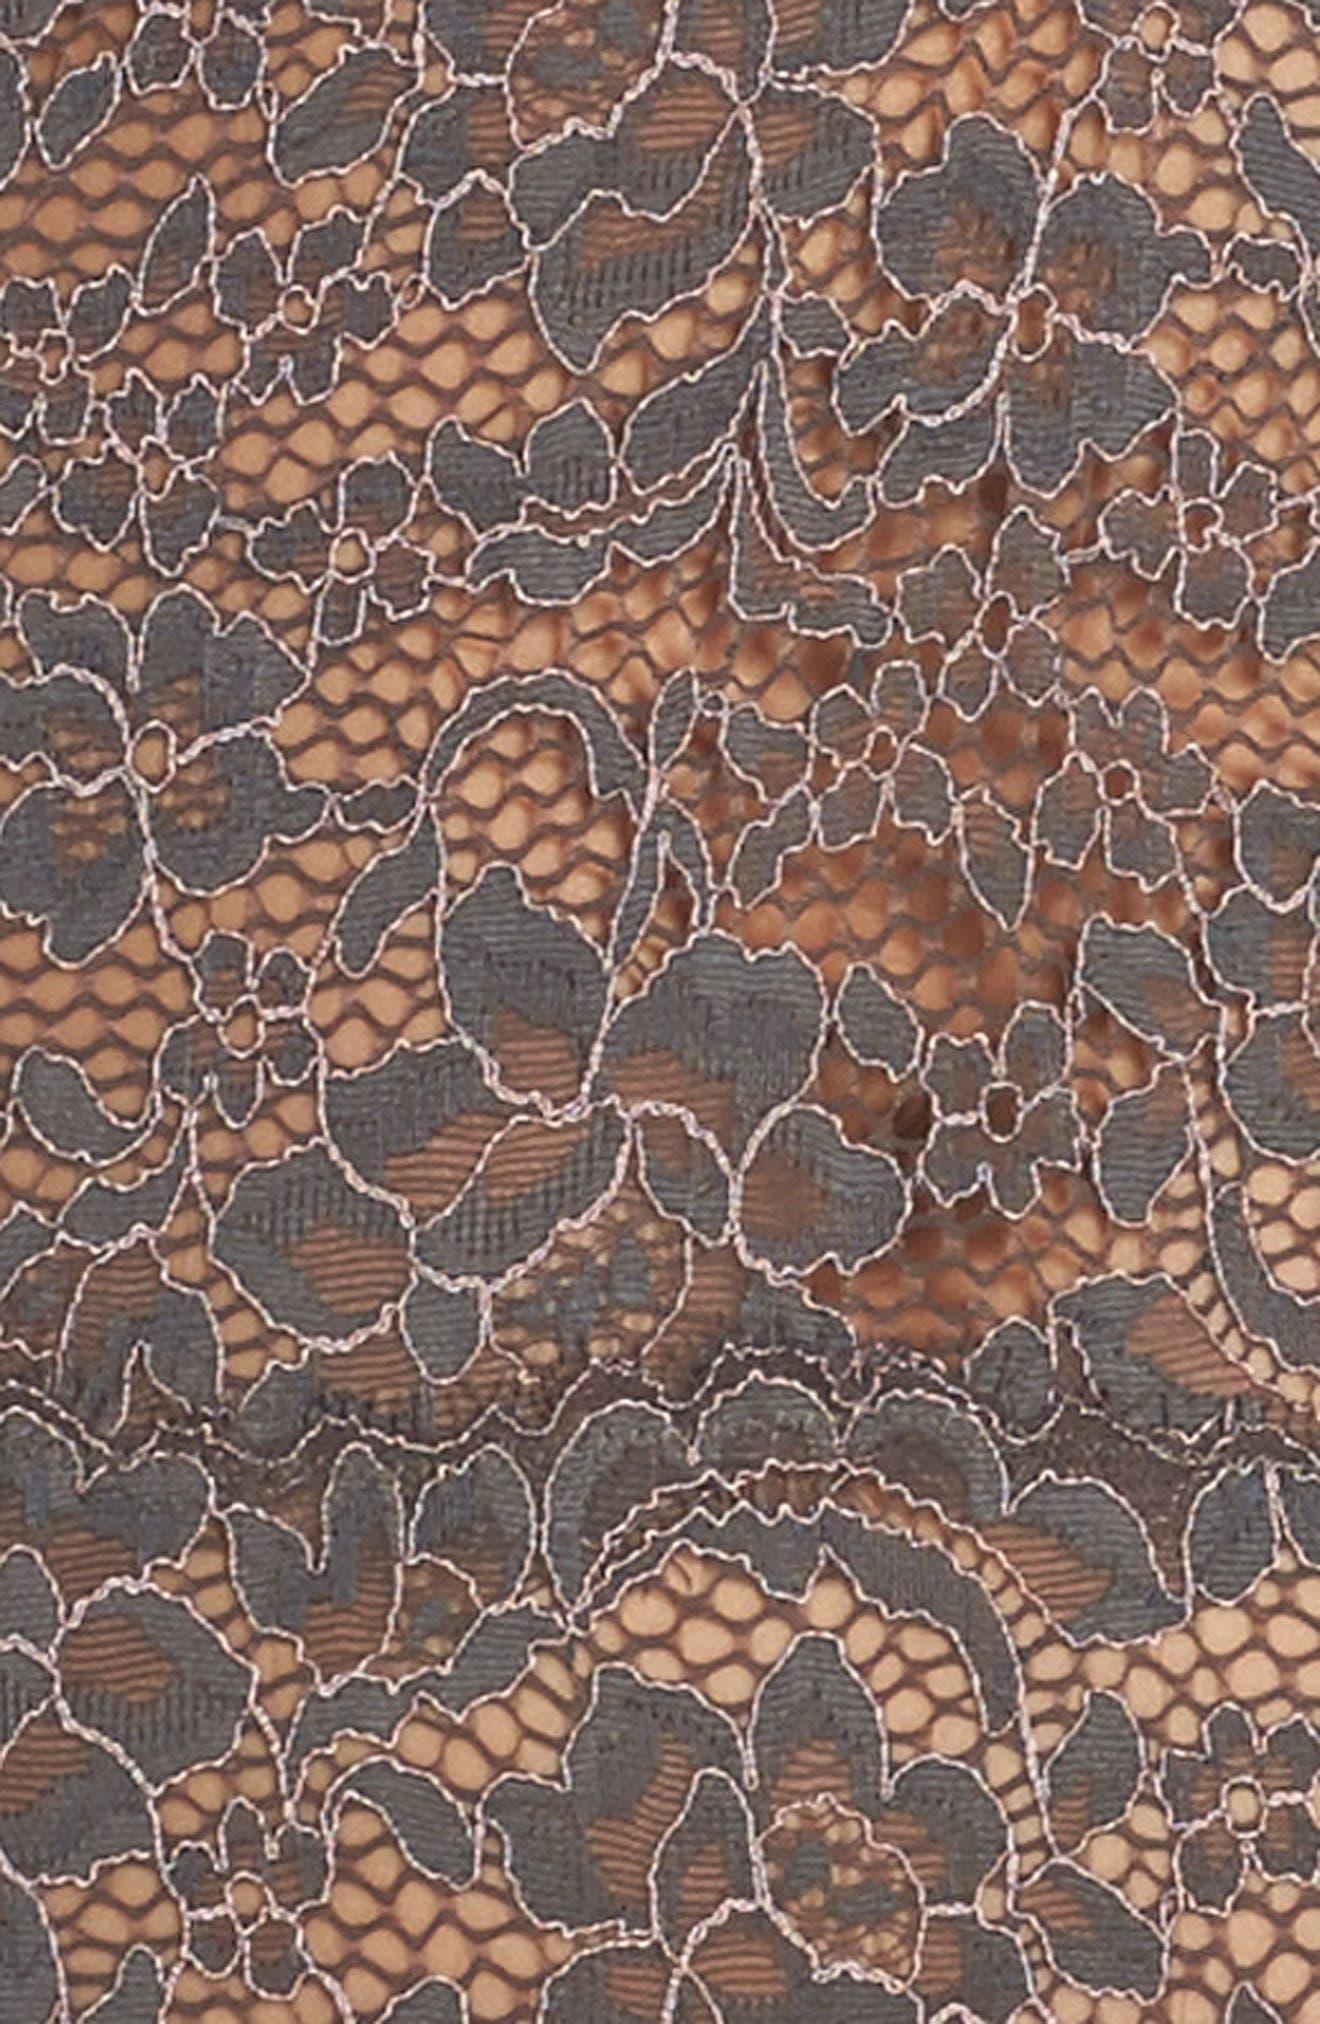 Pret Thong Bodysuit,                             Alternate thumbnail 4, color,                             Graphite/ Stone